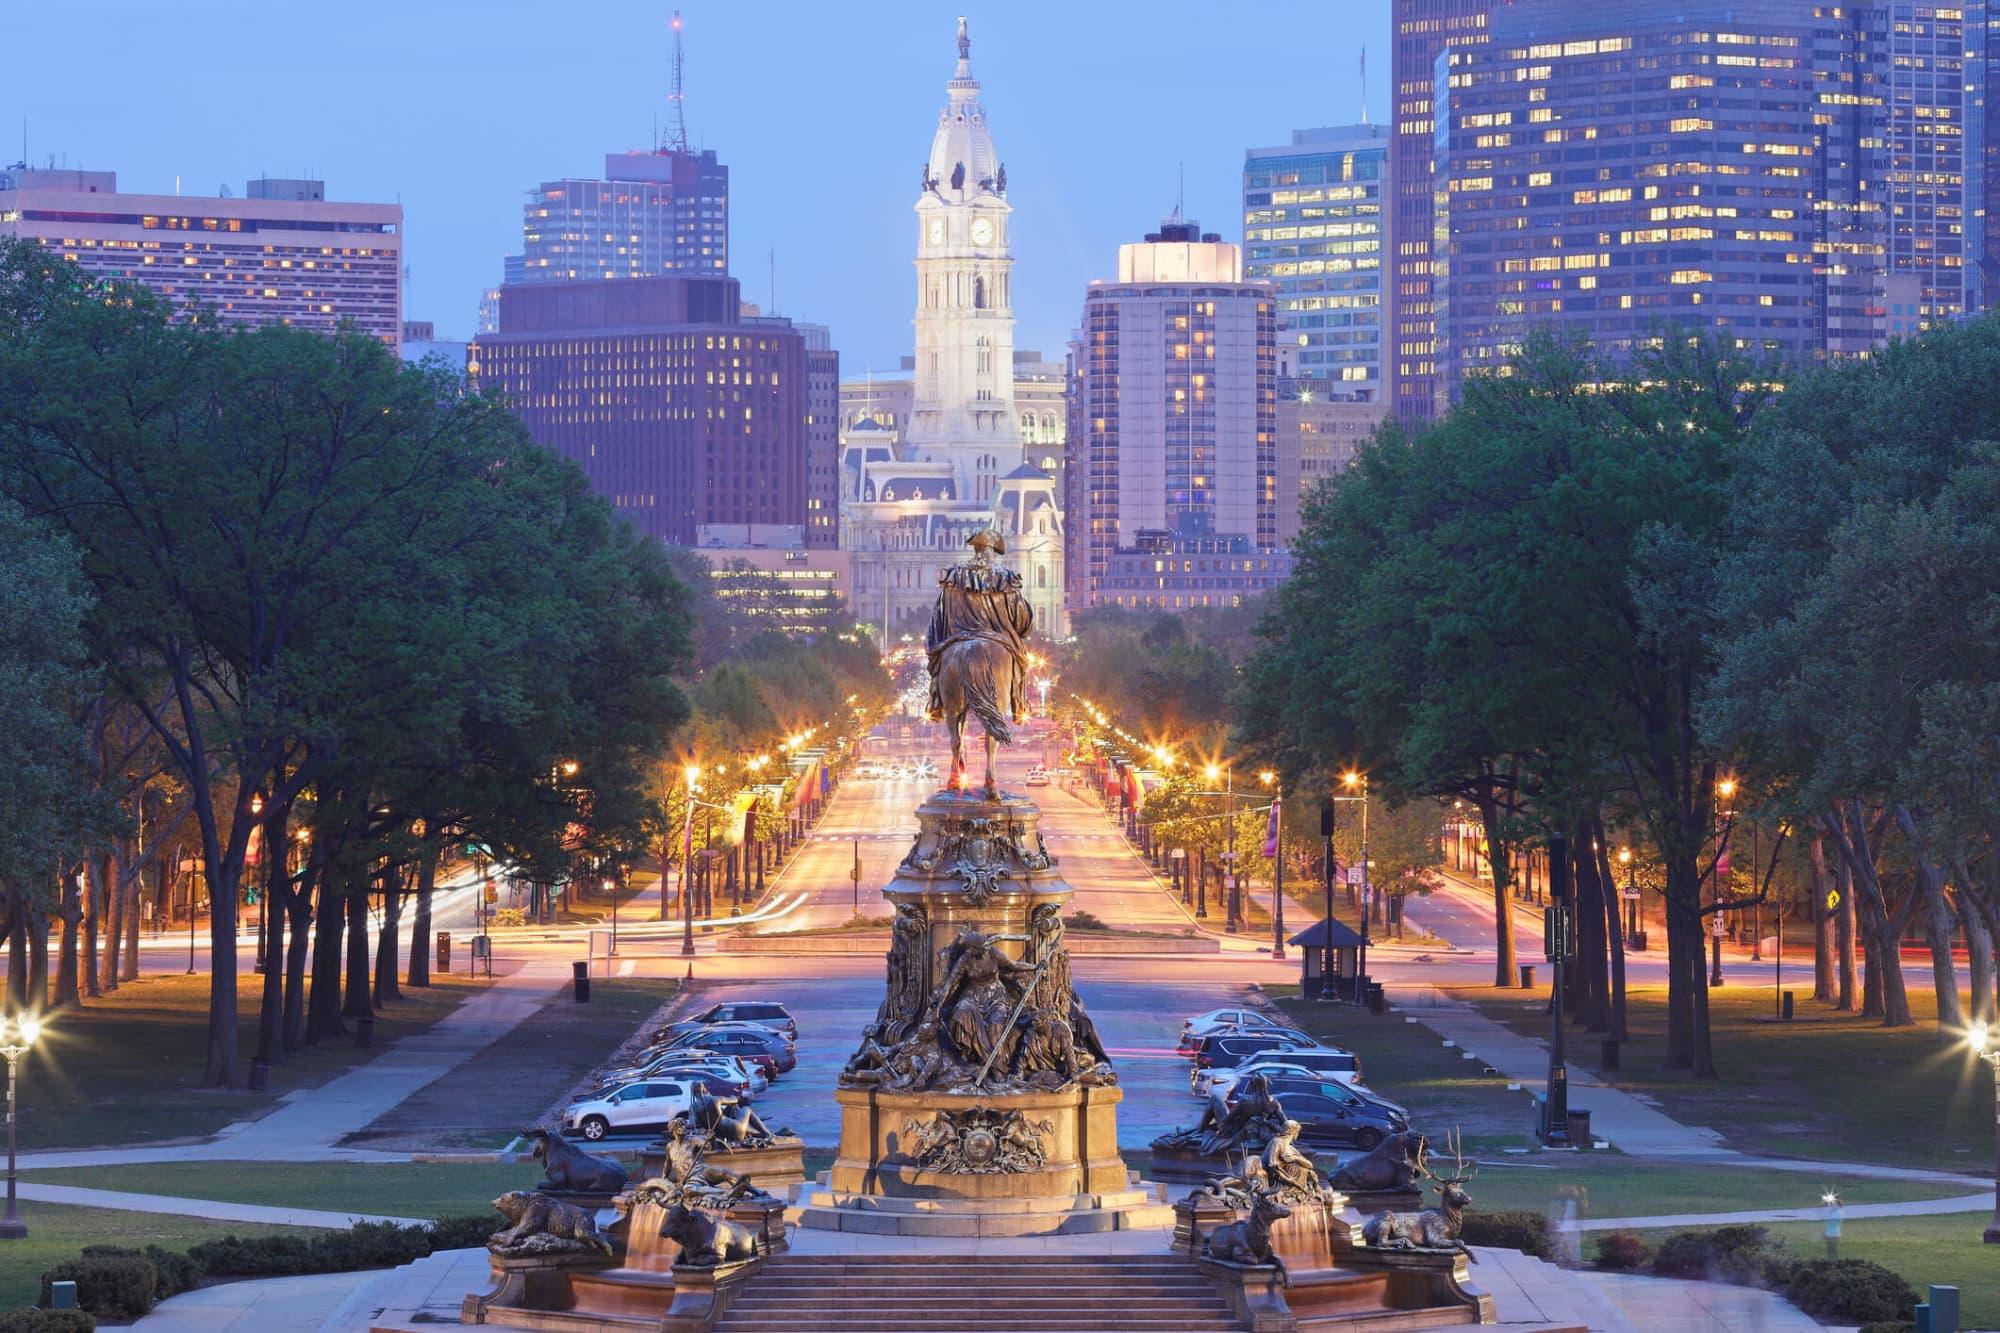 The Best Pennsylvania Online Nurse Practitioner Programs for 2021